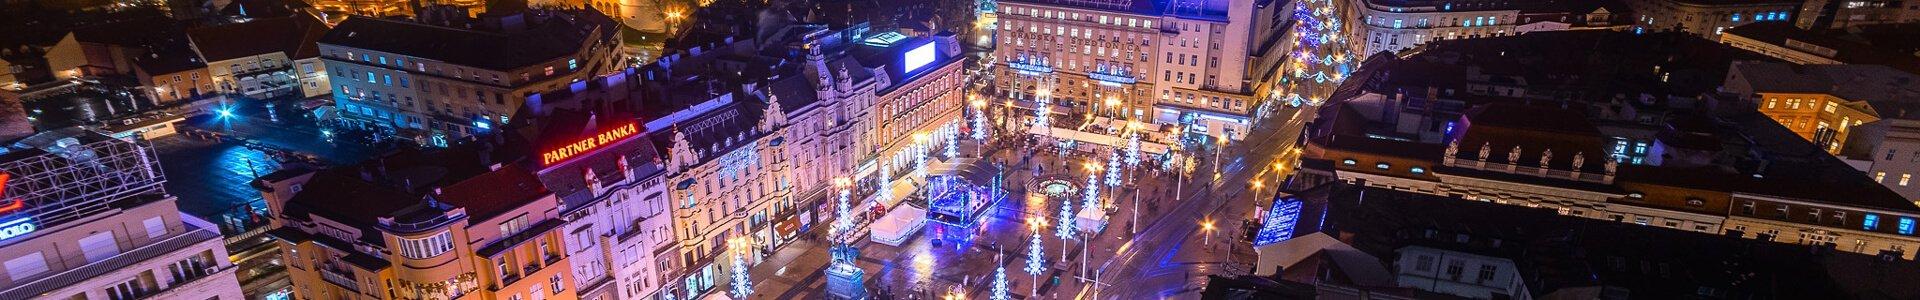 Zagreb DMC